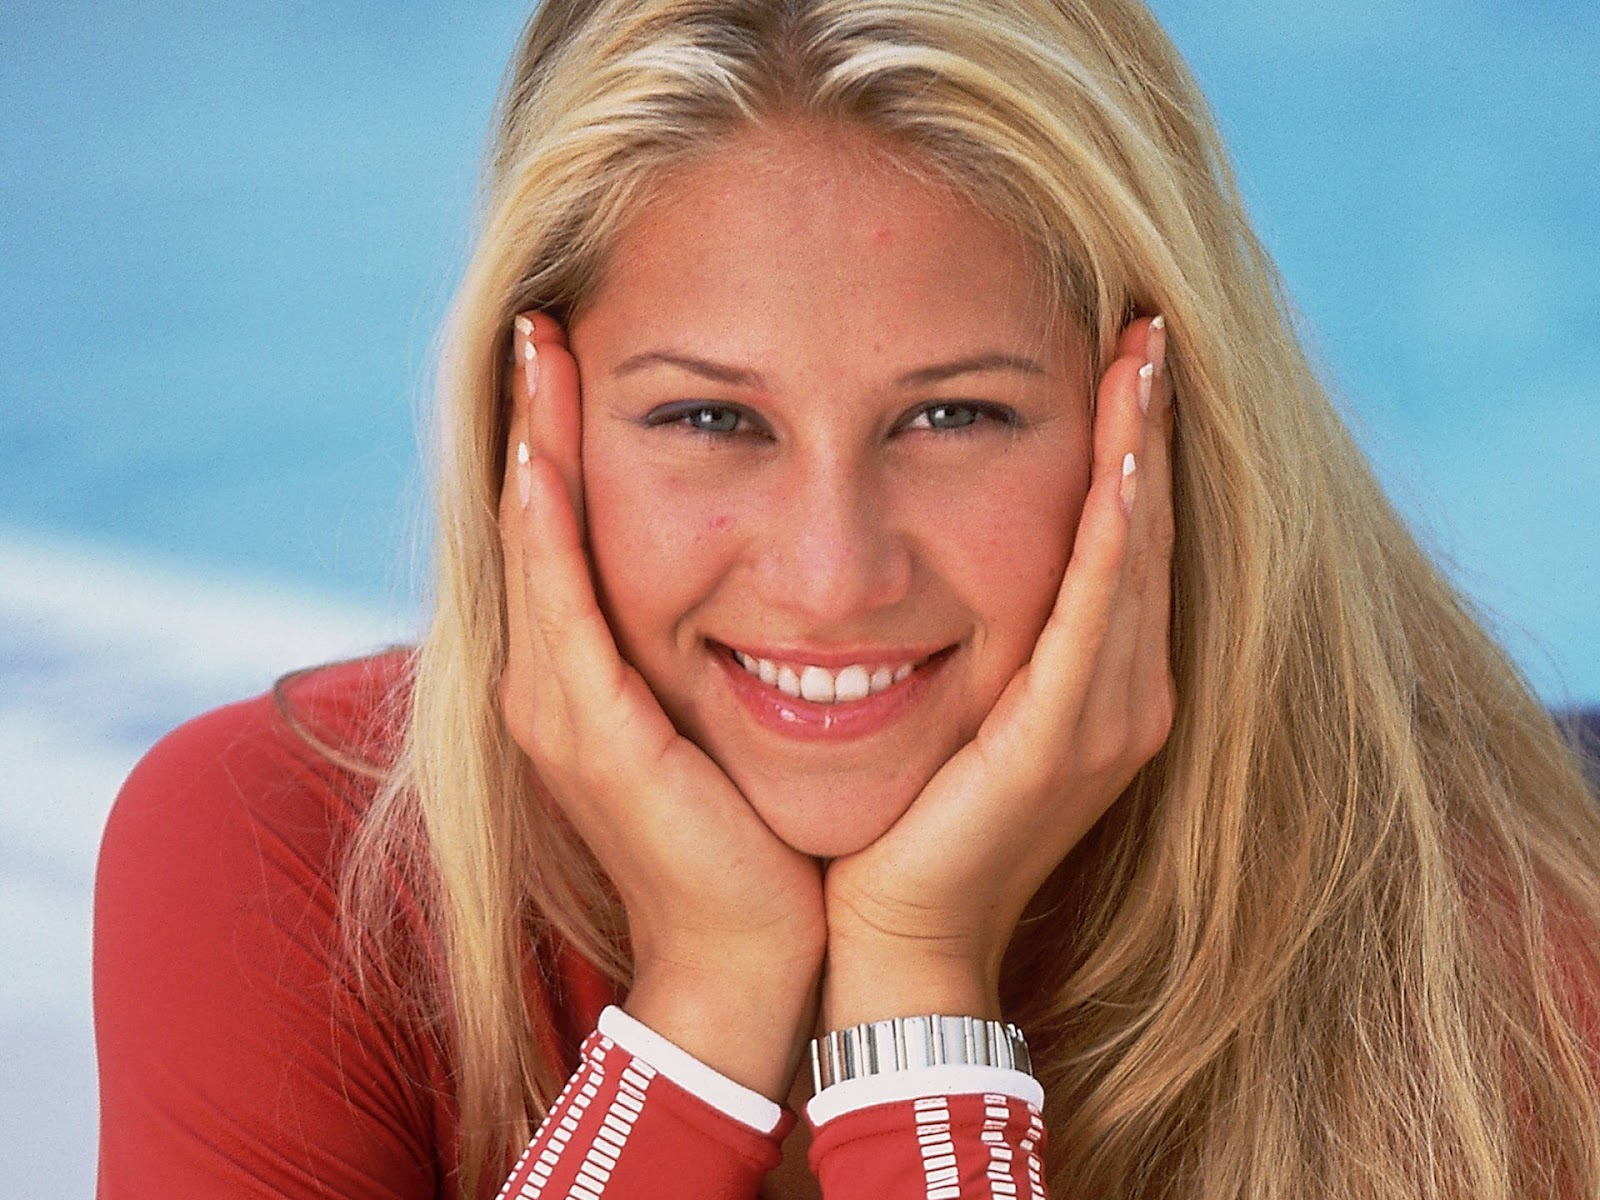 http://1.bp.blogspot.com/-QaOXDavoC9I/UBQcp5d53AI/AAAAAAAAC2U/WhWHdQCZEZk/s1600/Anna-Kournikova-Tennis.jpg